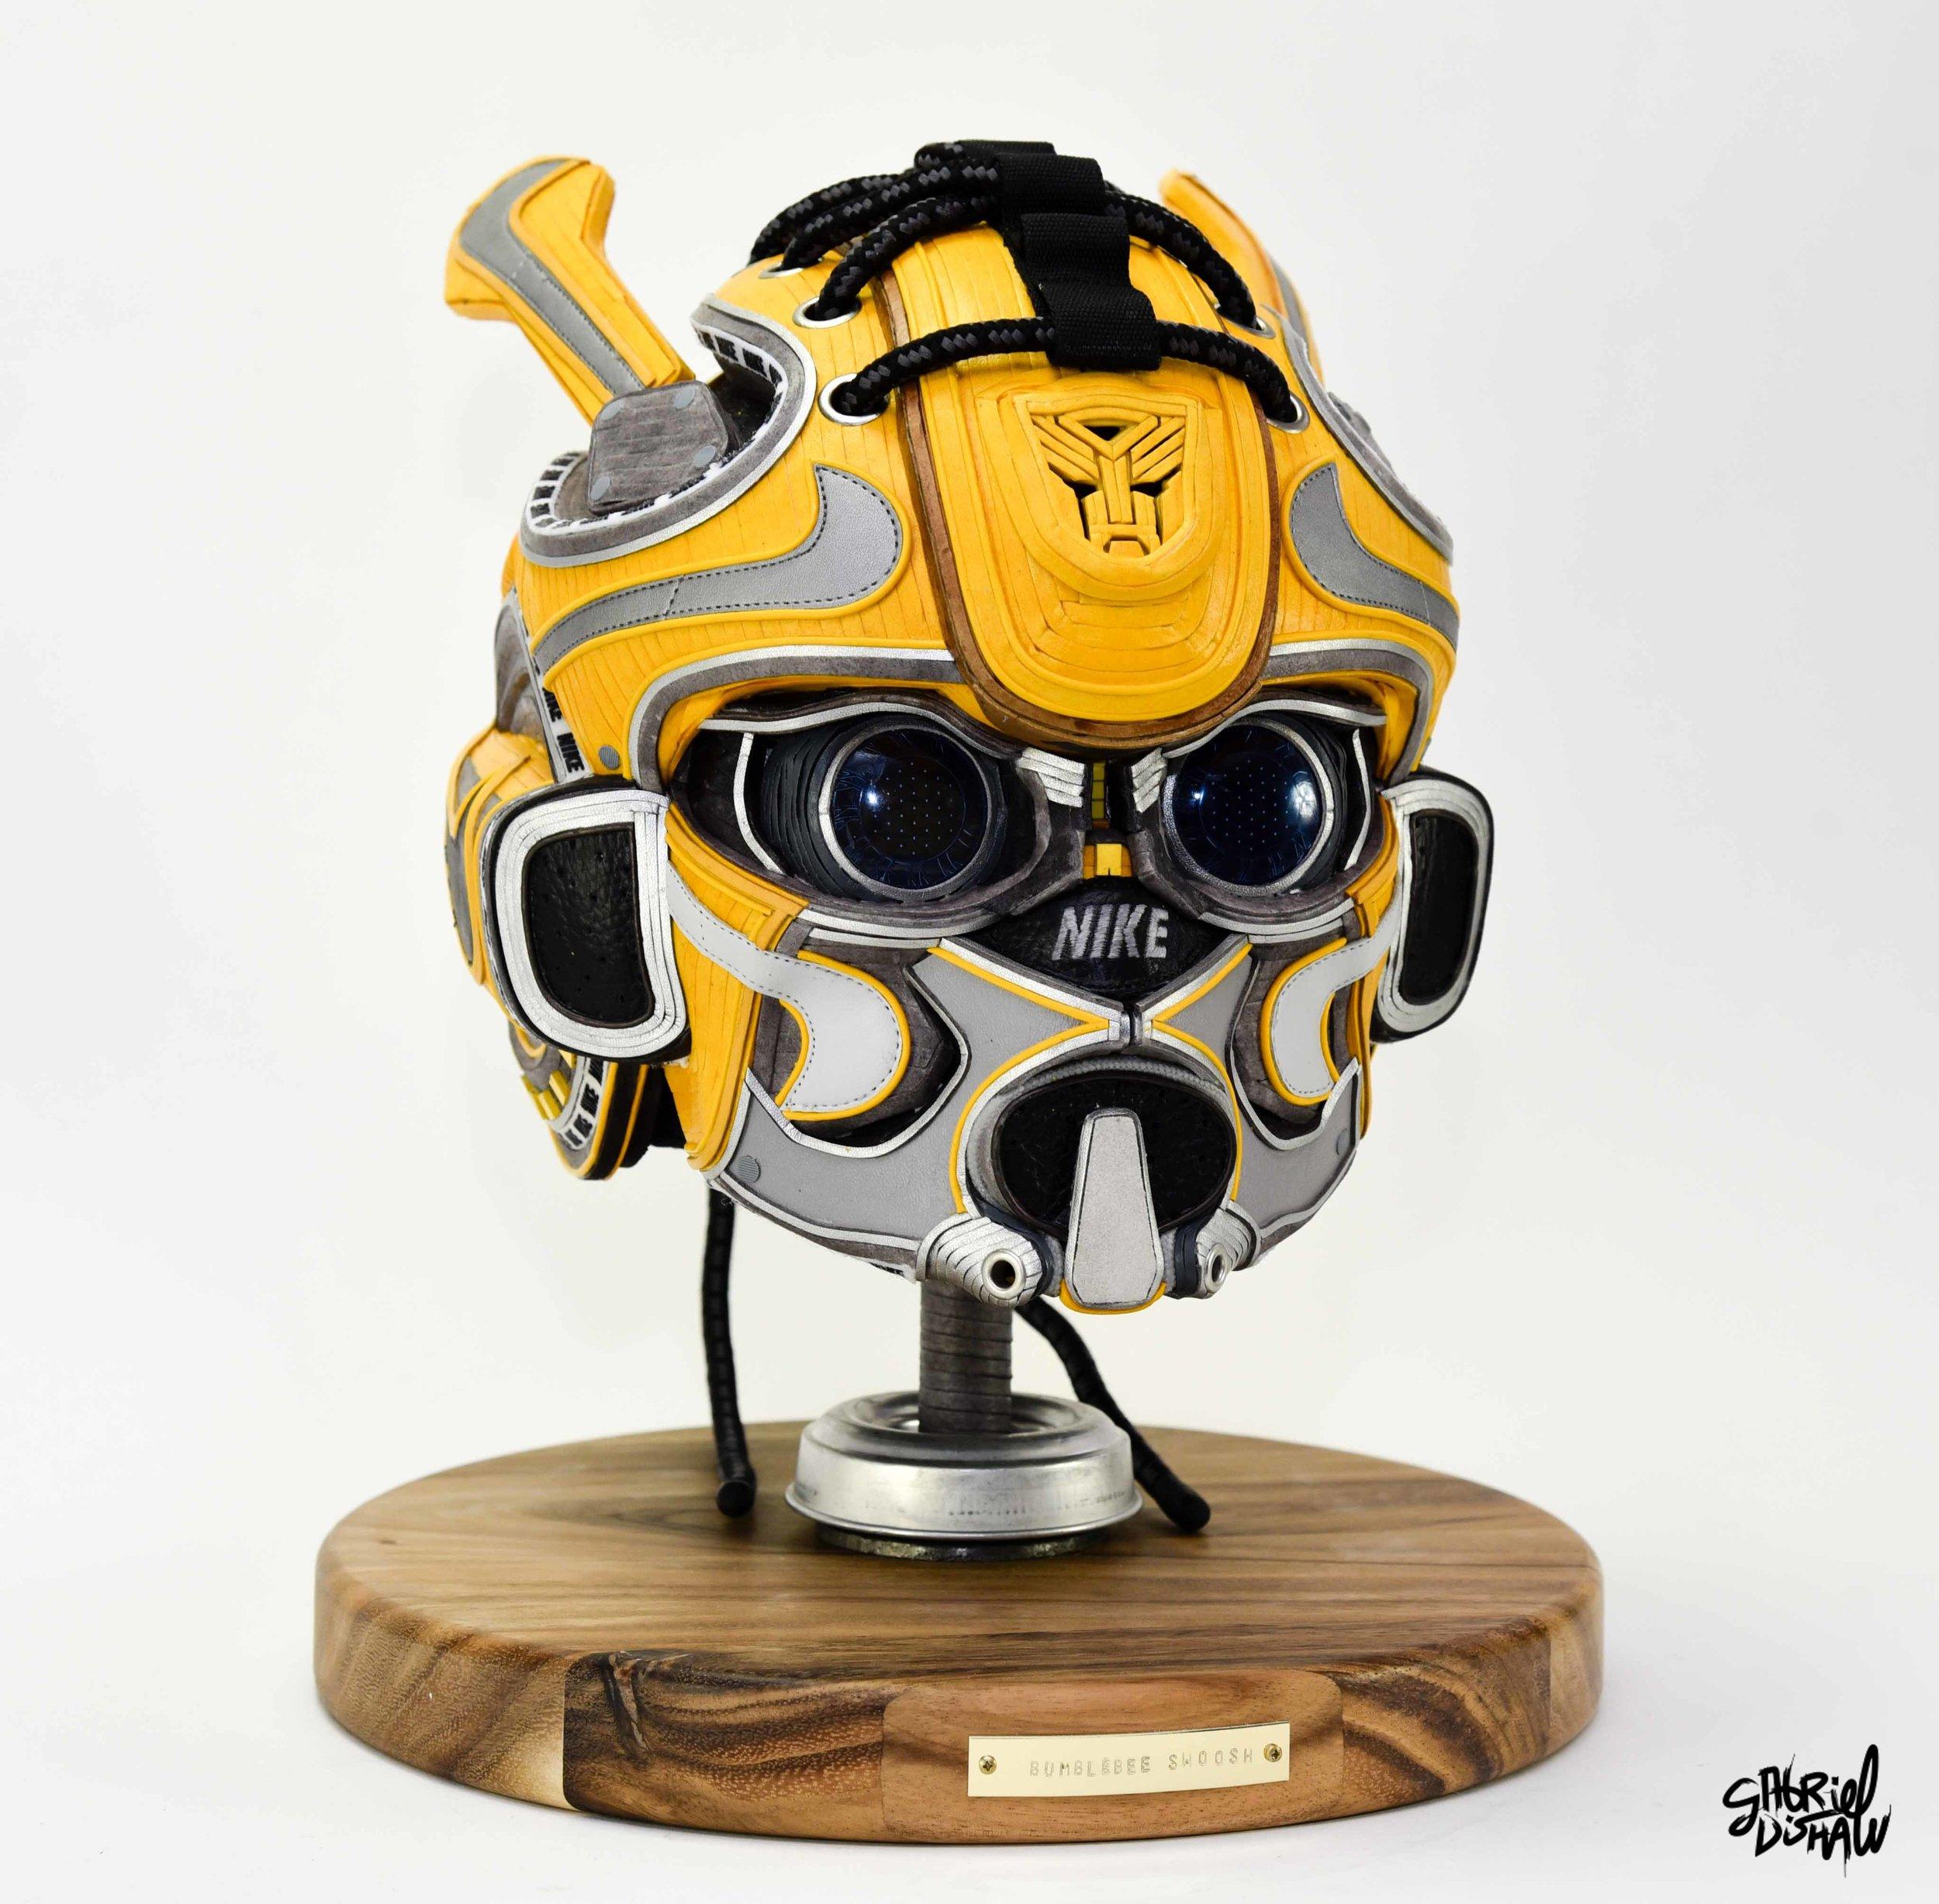 Gabriel Dishaw Bumblebee Swoosh-8357.jpg